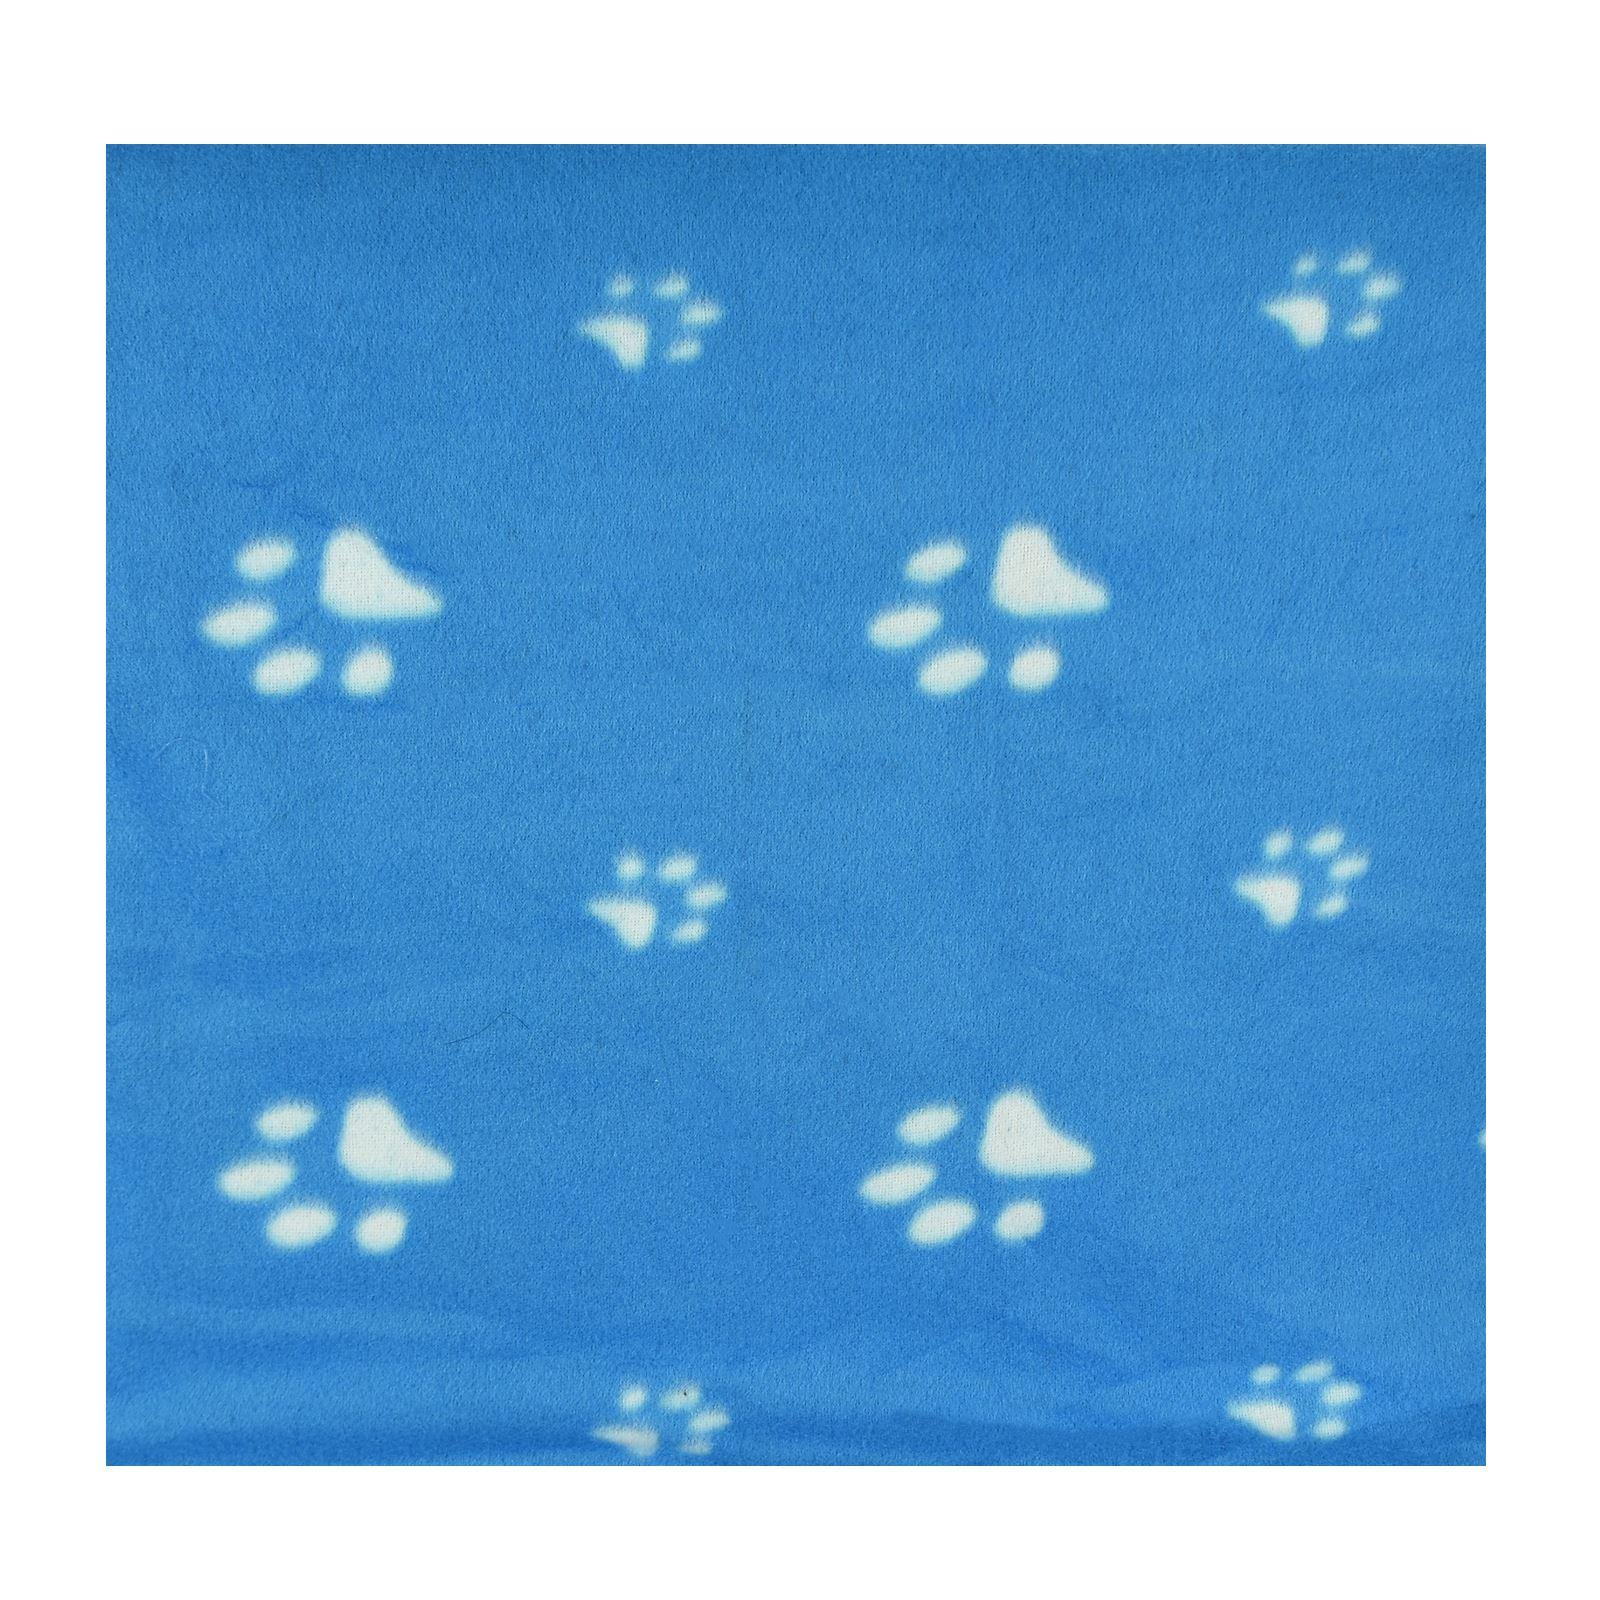 Warm-Pet-Mat-Paw-Print-Cat-Dog-Puppy-Fleece-Soft-Blanket-Bed-Cushion-One-Size thumbnail 9